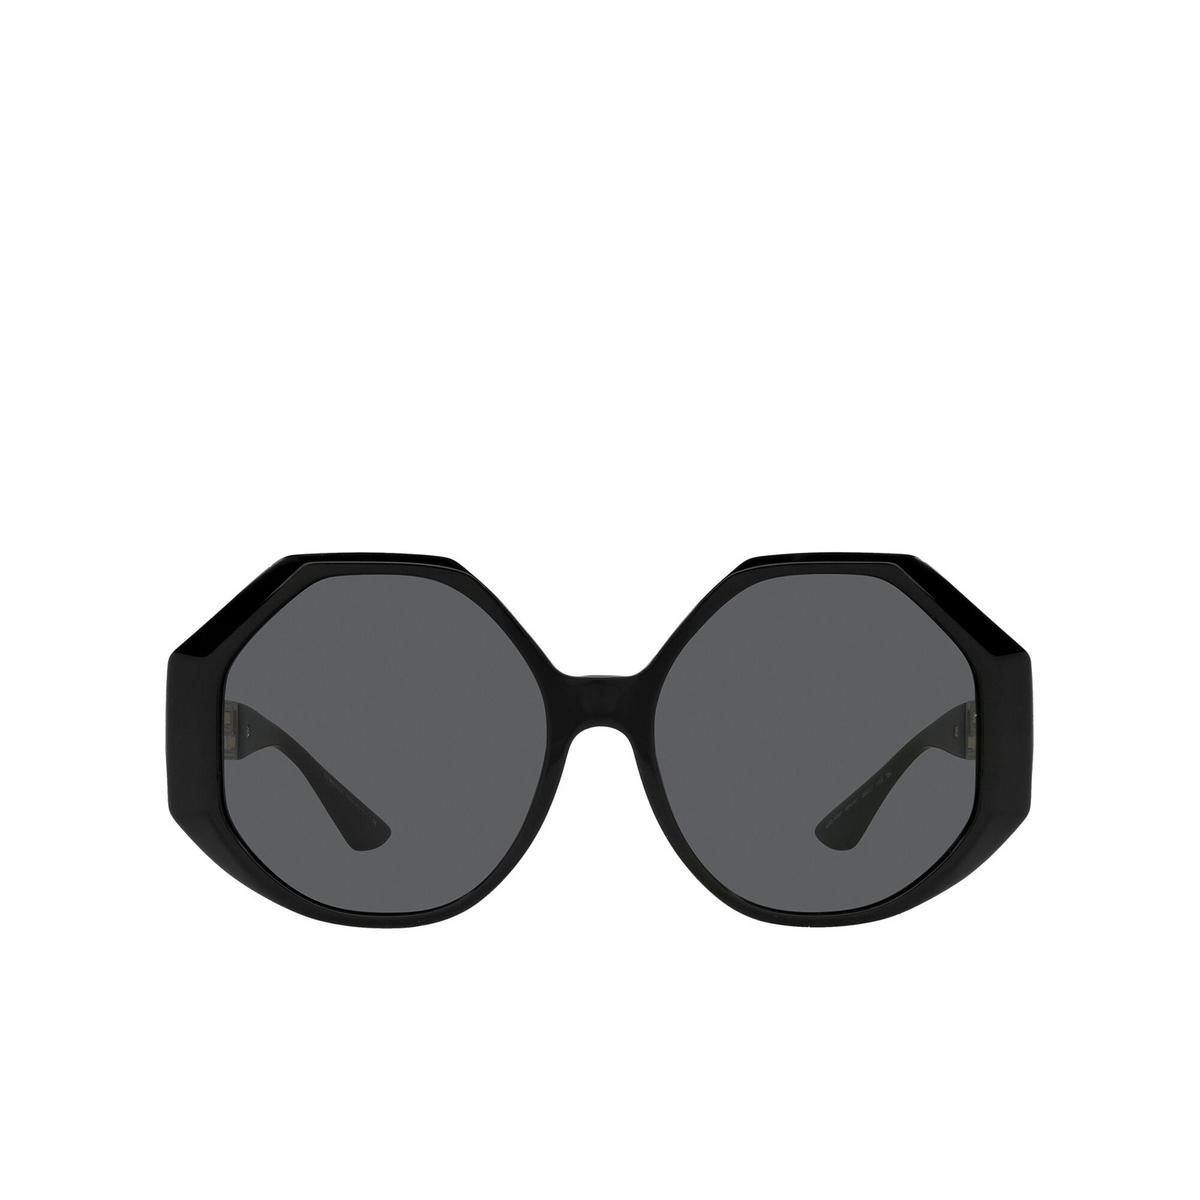 Versace® Irregular Sunglasses: VE4395 color Black GB1/87 - front view.